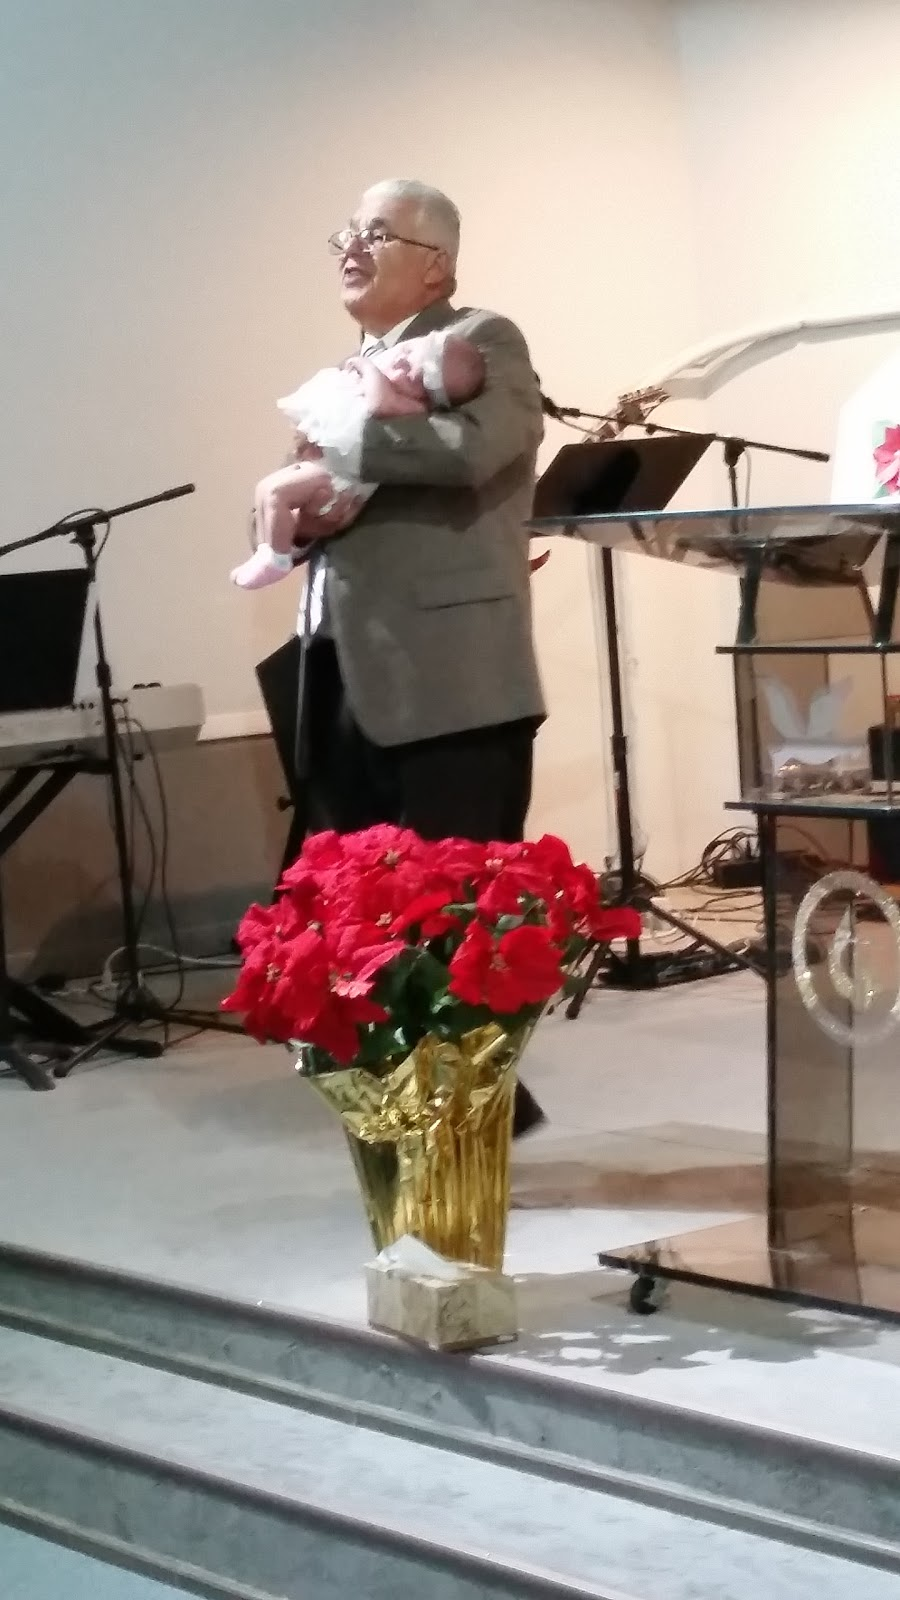 Grace Community Ministries - church  | Photo 1 of 2 | Address: 275 Skyline Dr, Carpentersville, IL 60110, USA | Phone: (224) 629-7885